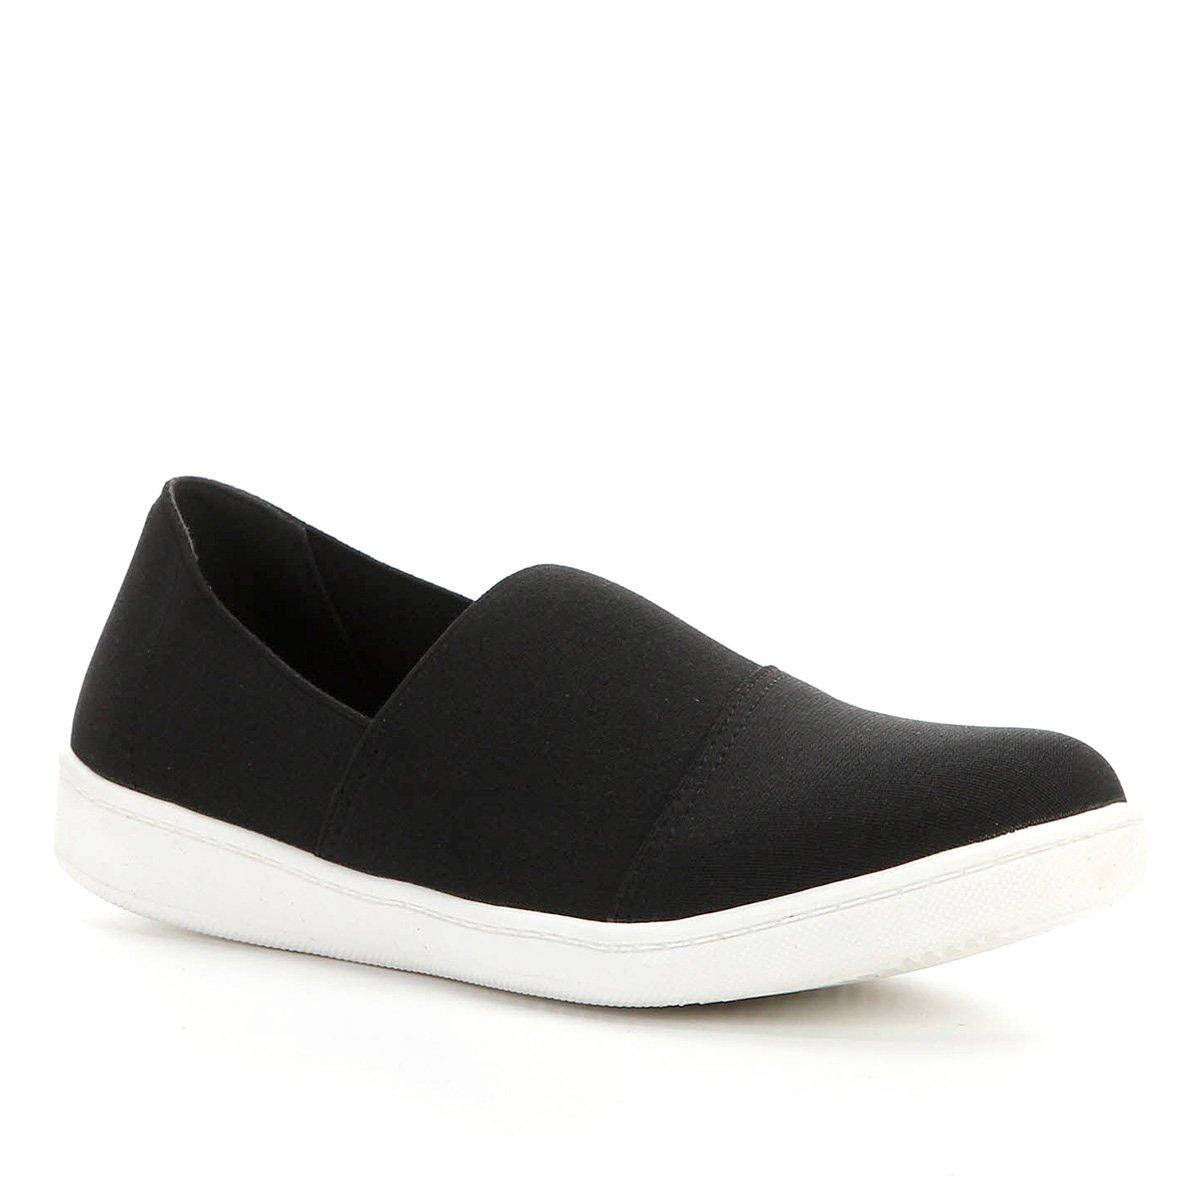 Tênis Shoestock Slip On Elástico Feminino